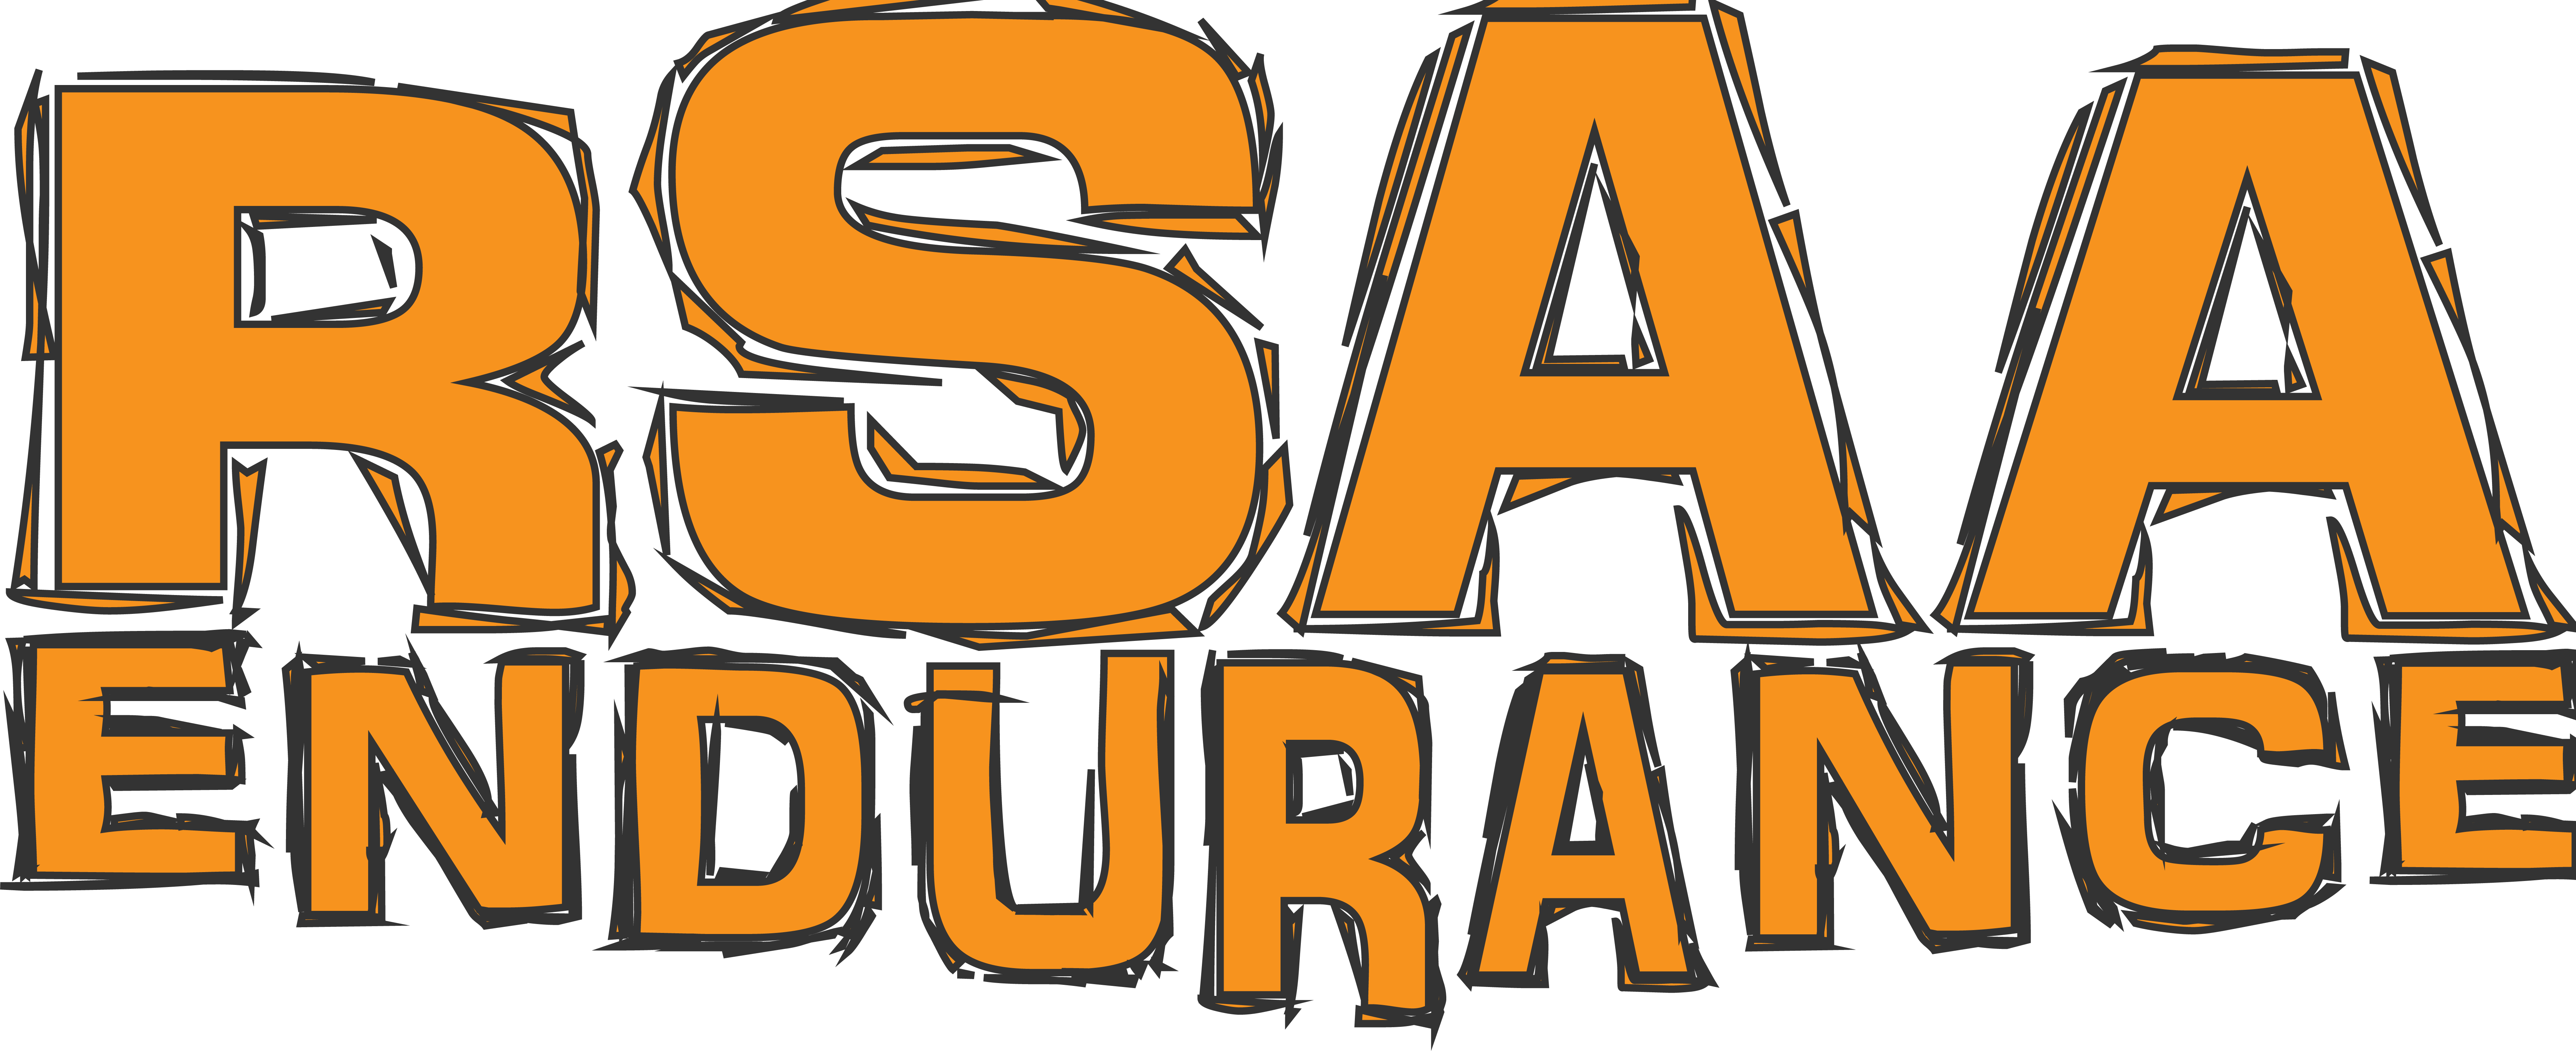 RSAA Endurance